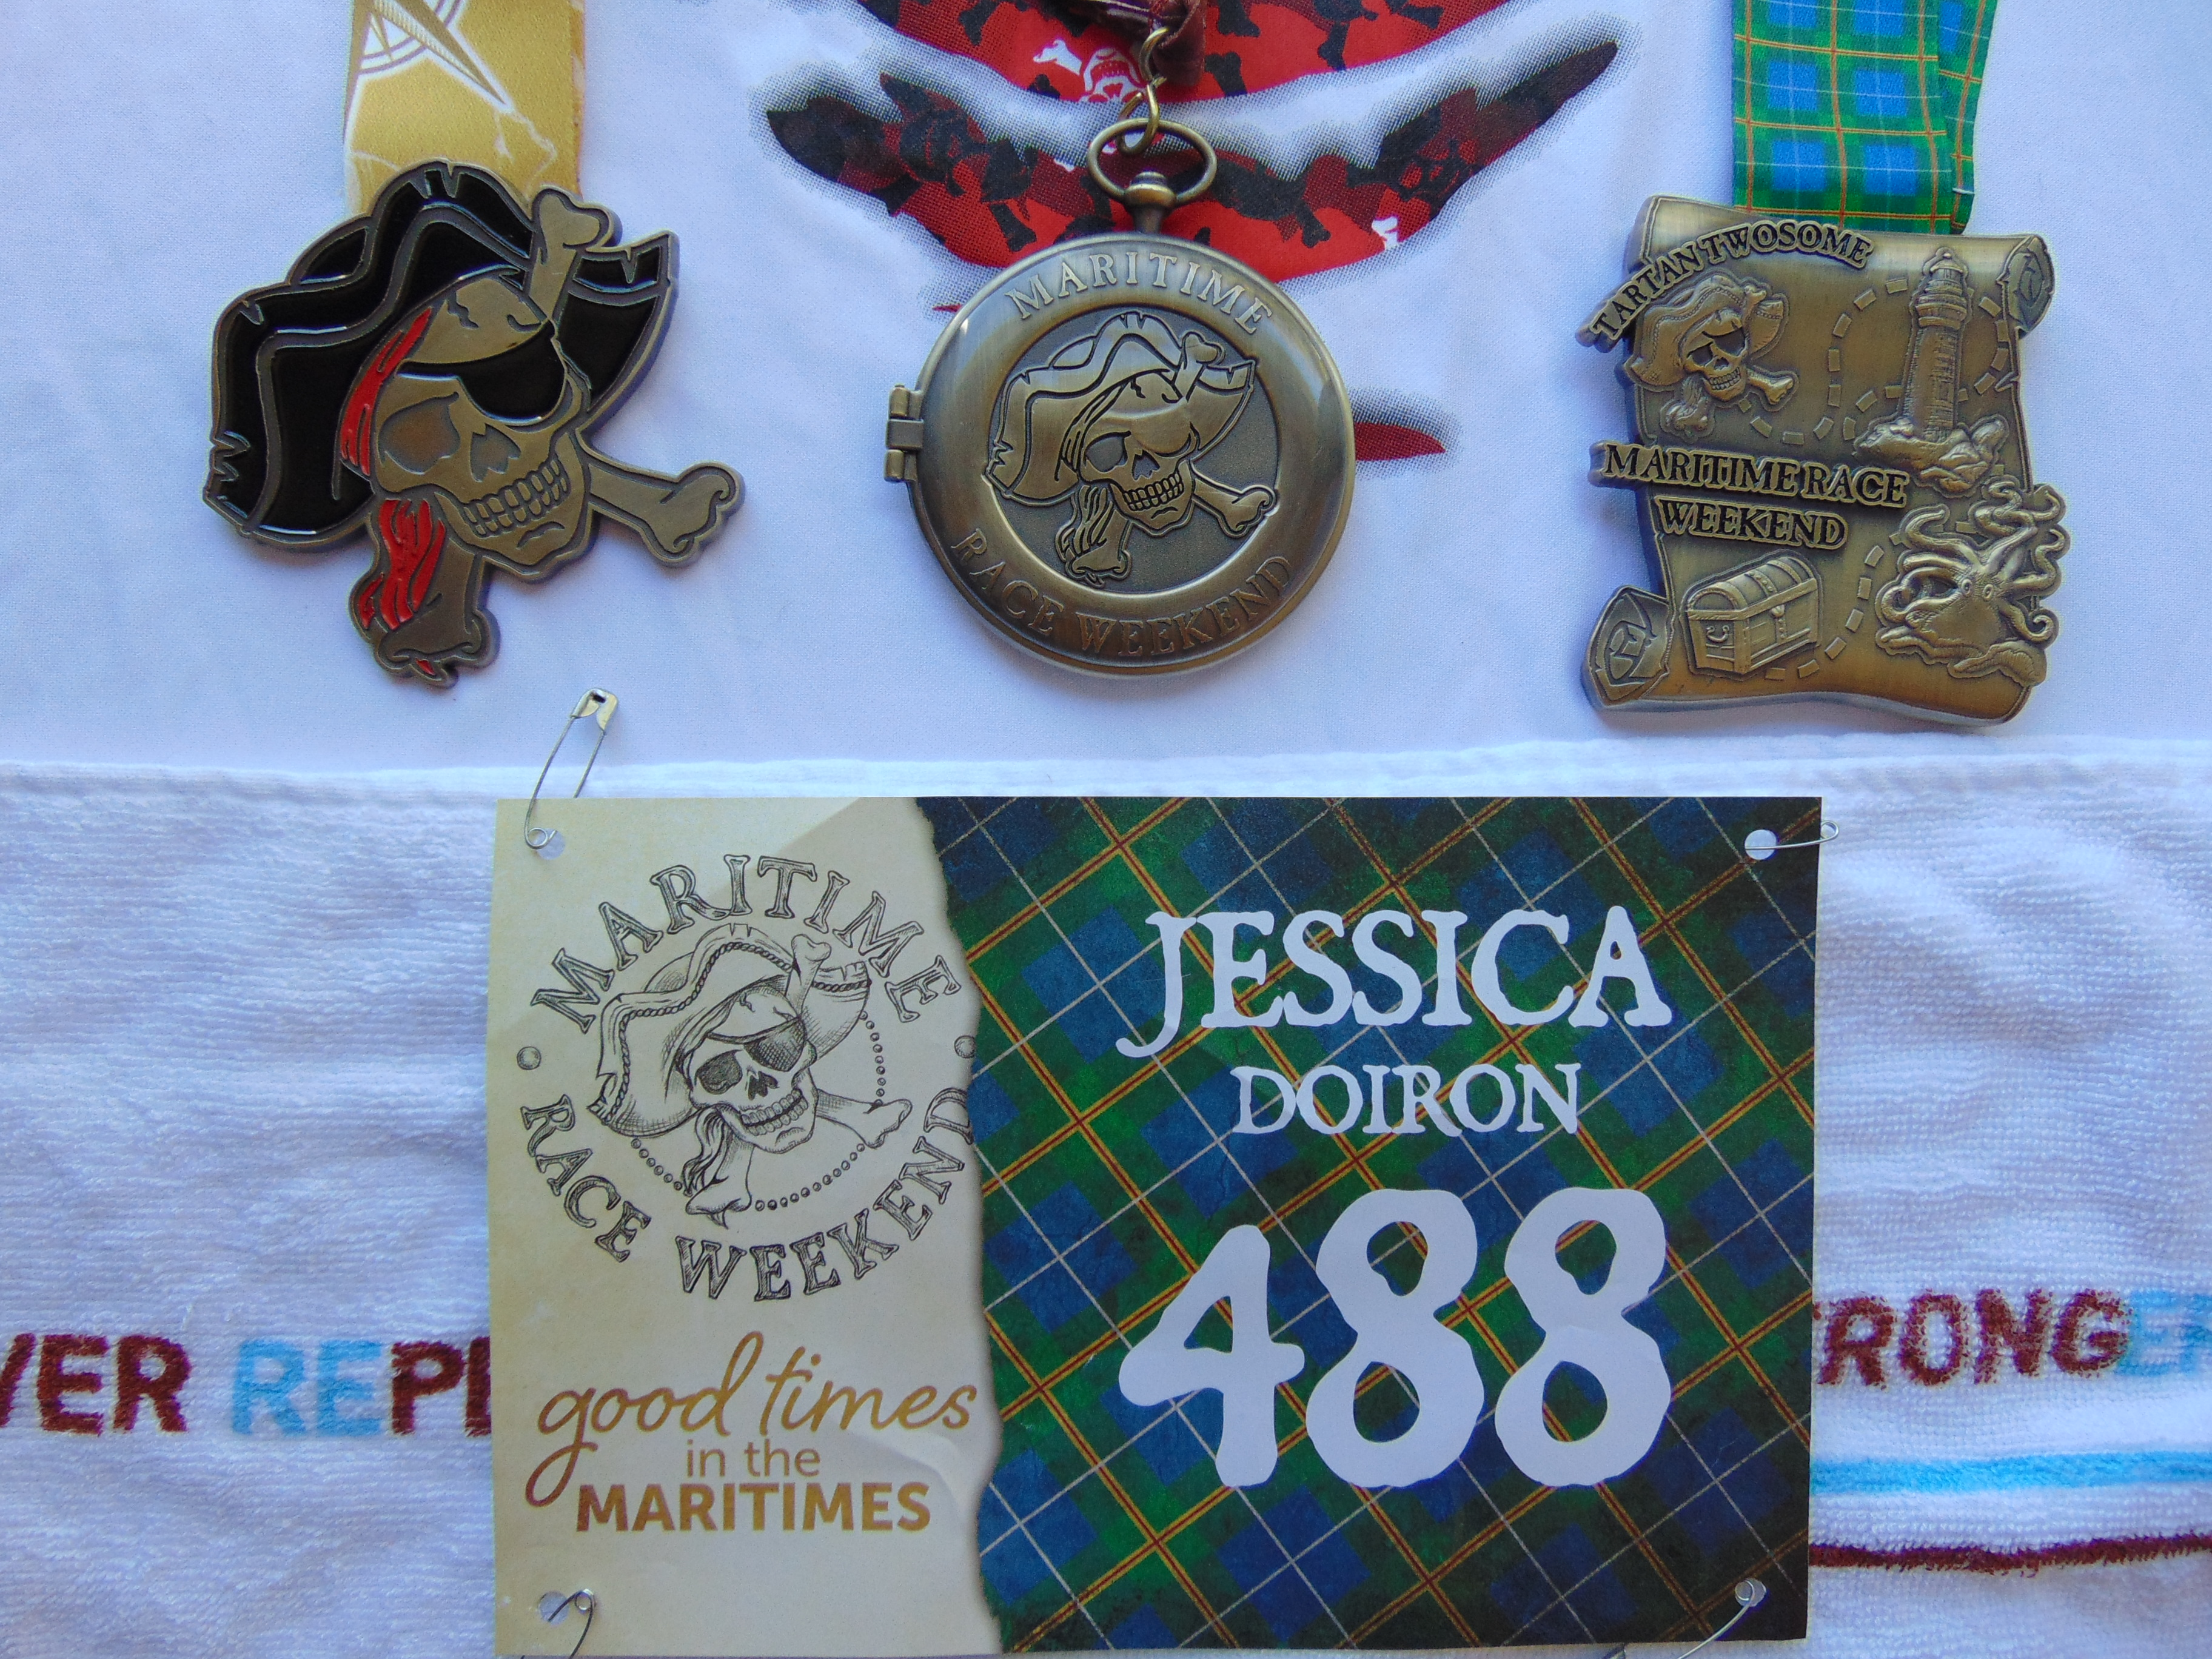 maritime race weekend 2015 medals